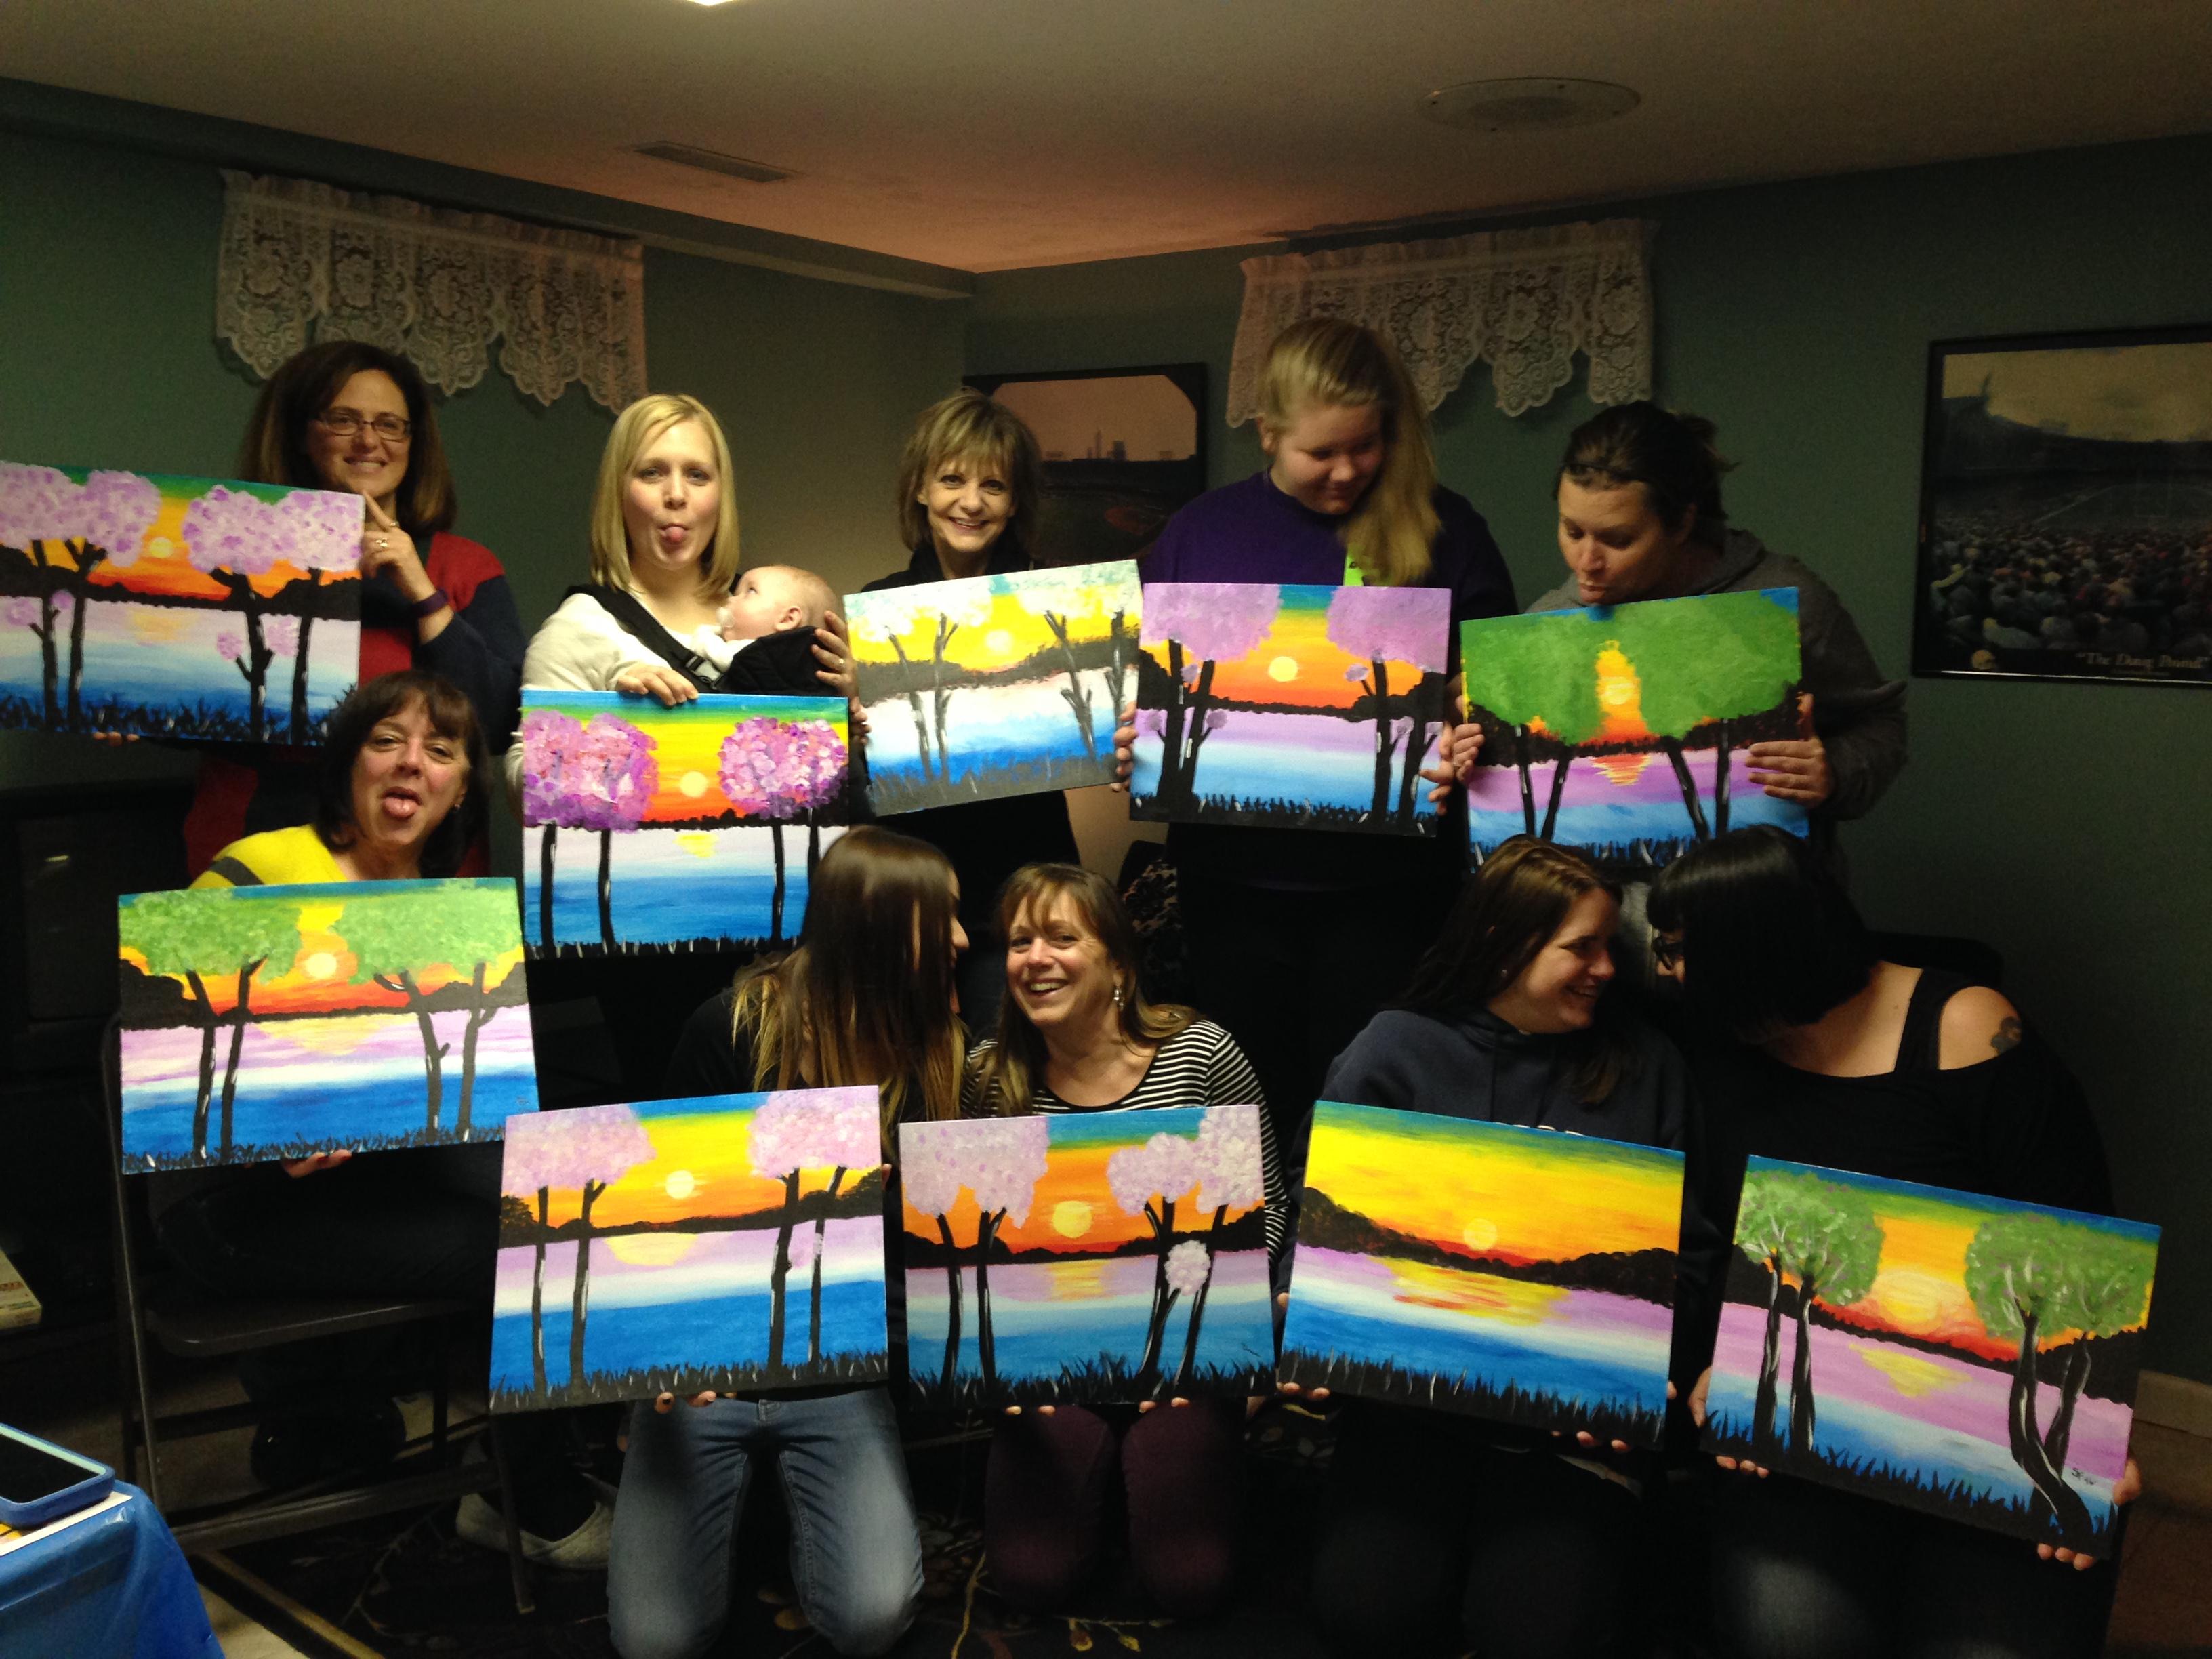 Jennifer Caulkins family painting nite 1/17/16